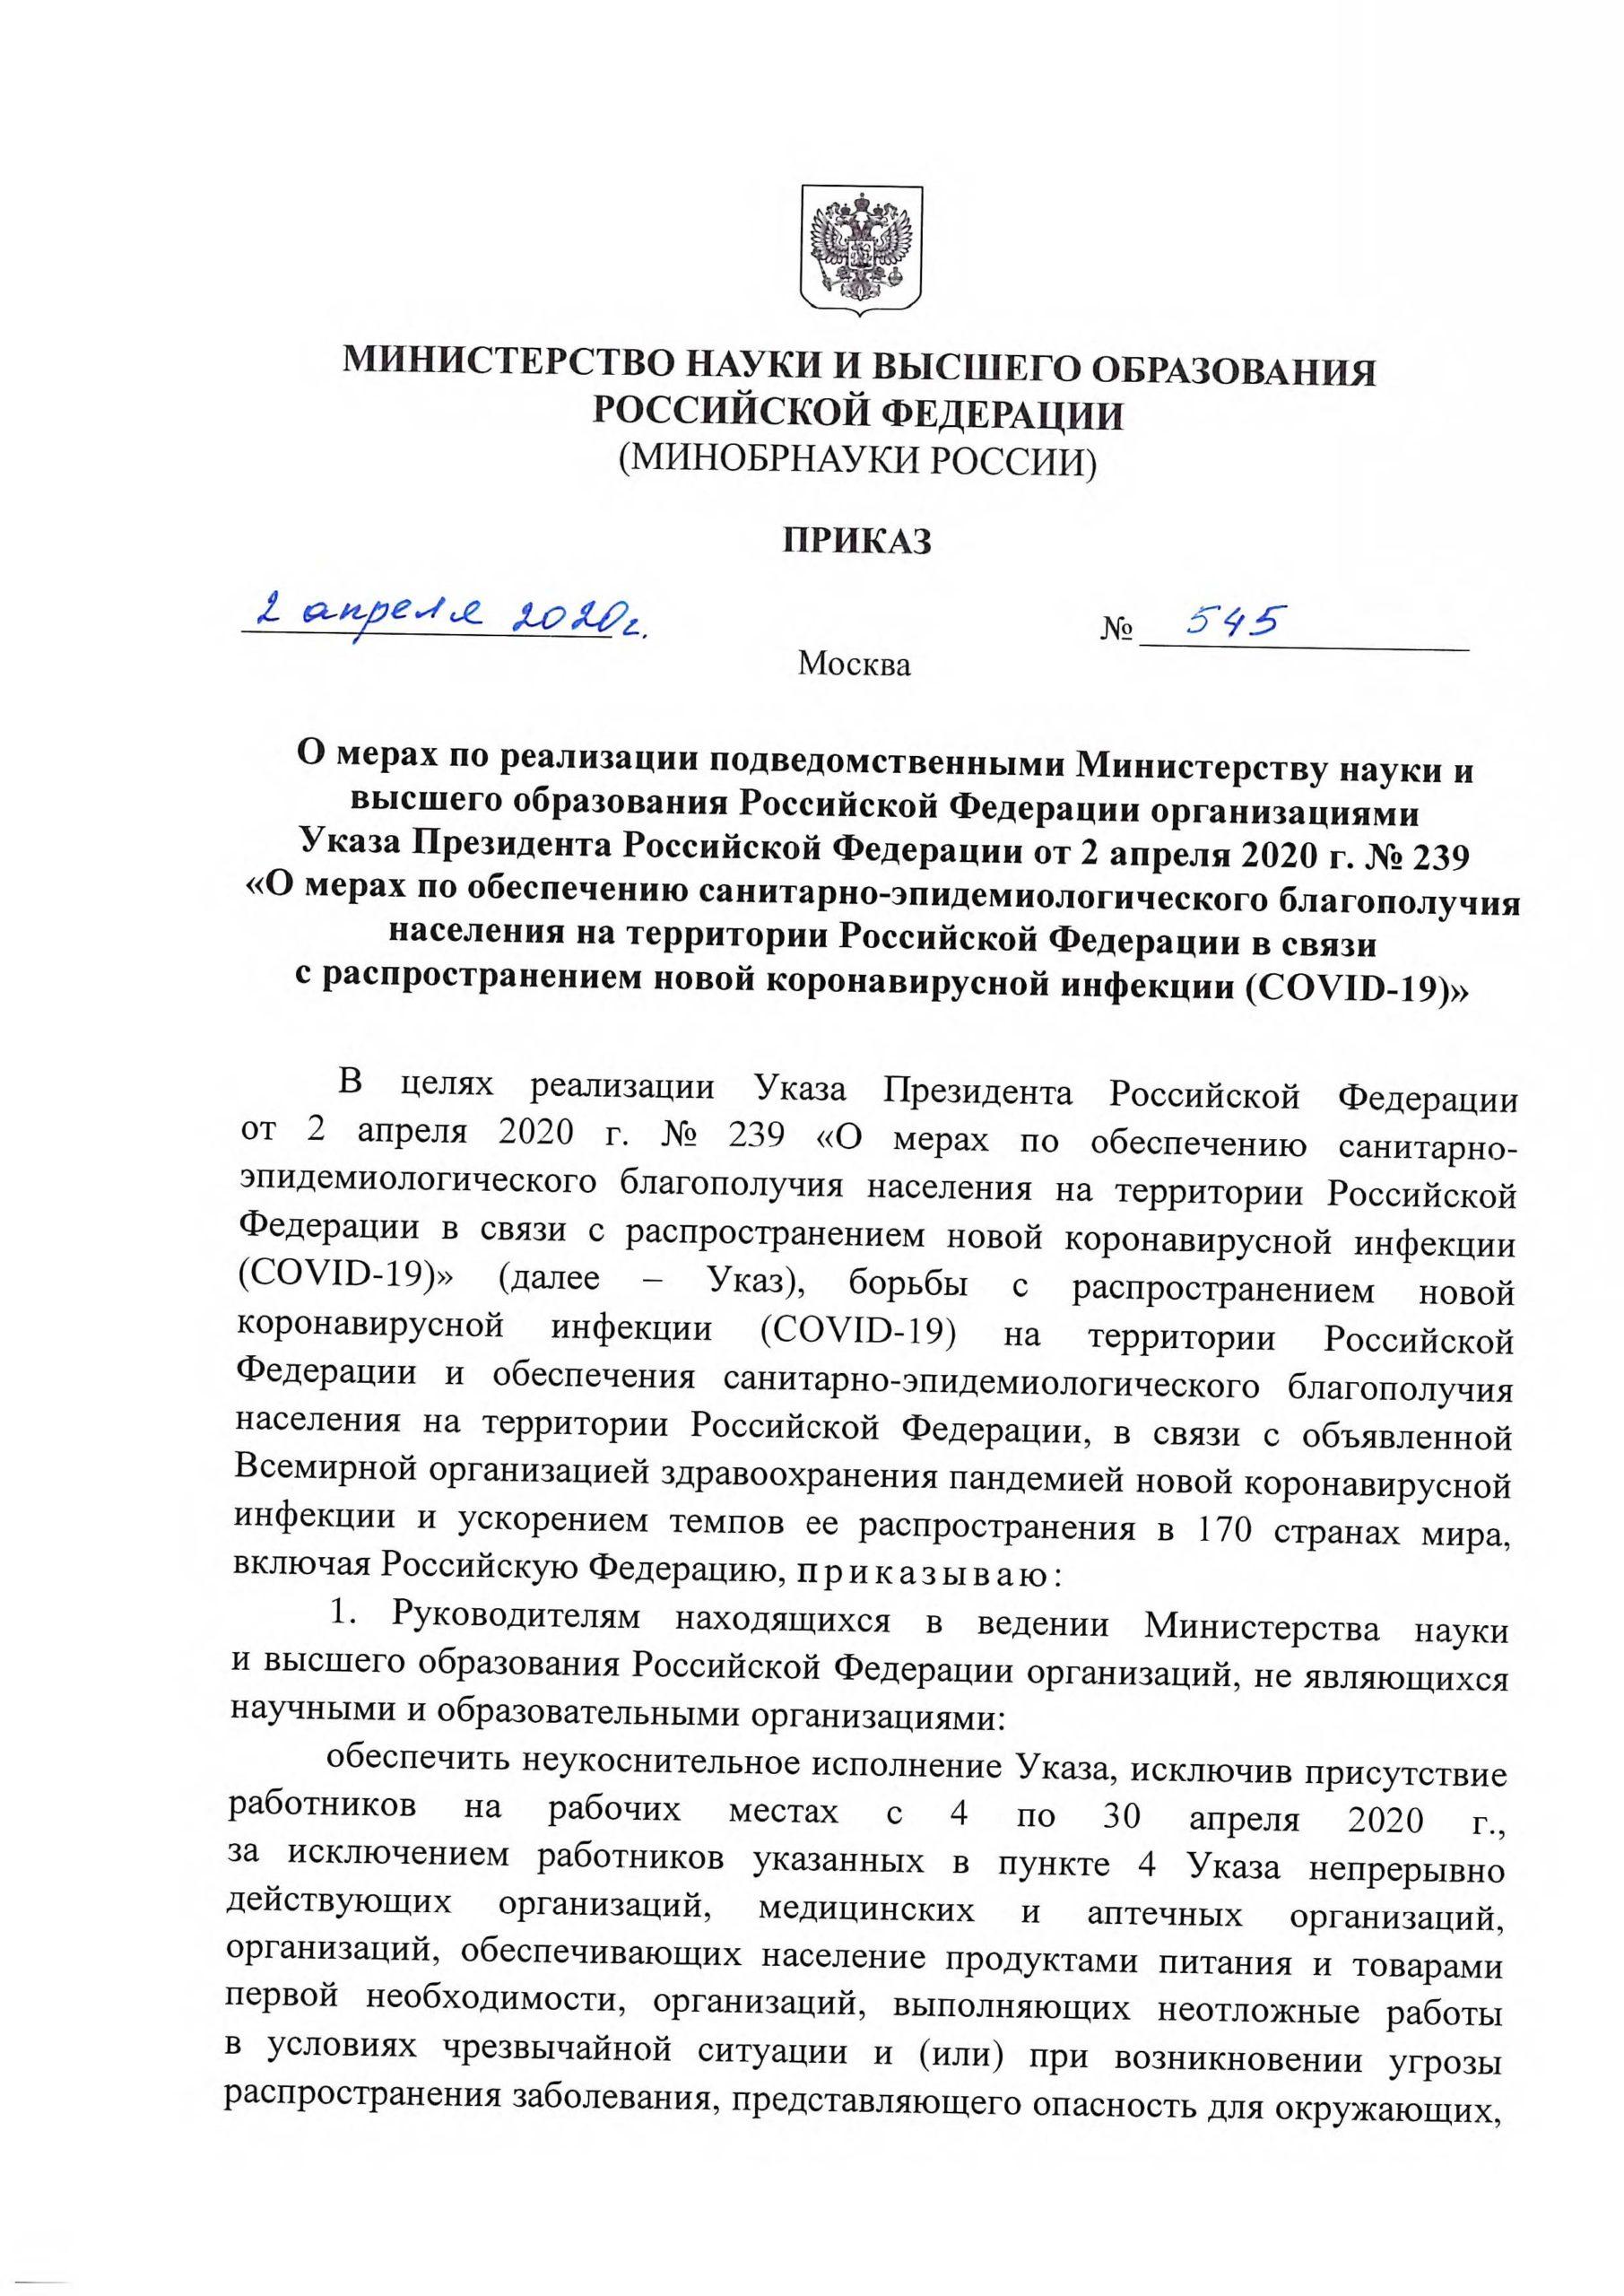 2020.04.02_prikaz_545_Falkov_V..pdf_Страница_1